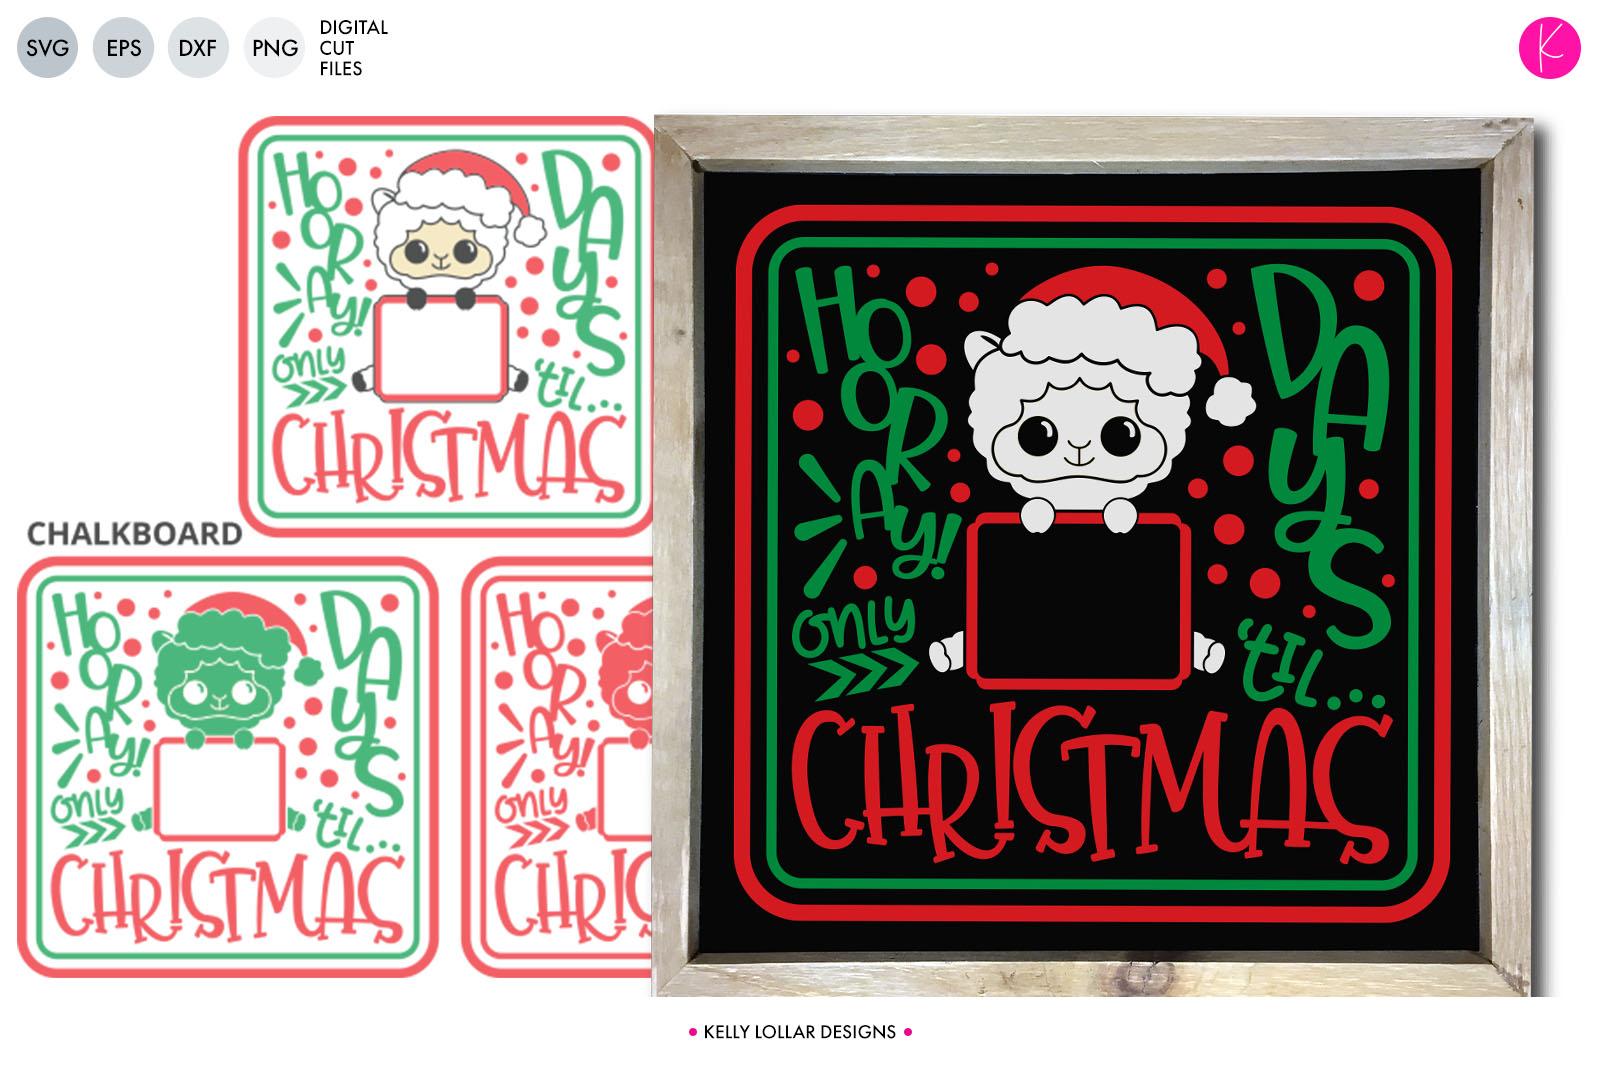 kld-Llama-Christmas-Countdown-Preview.jpg